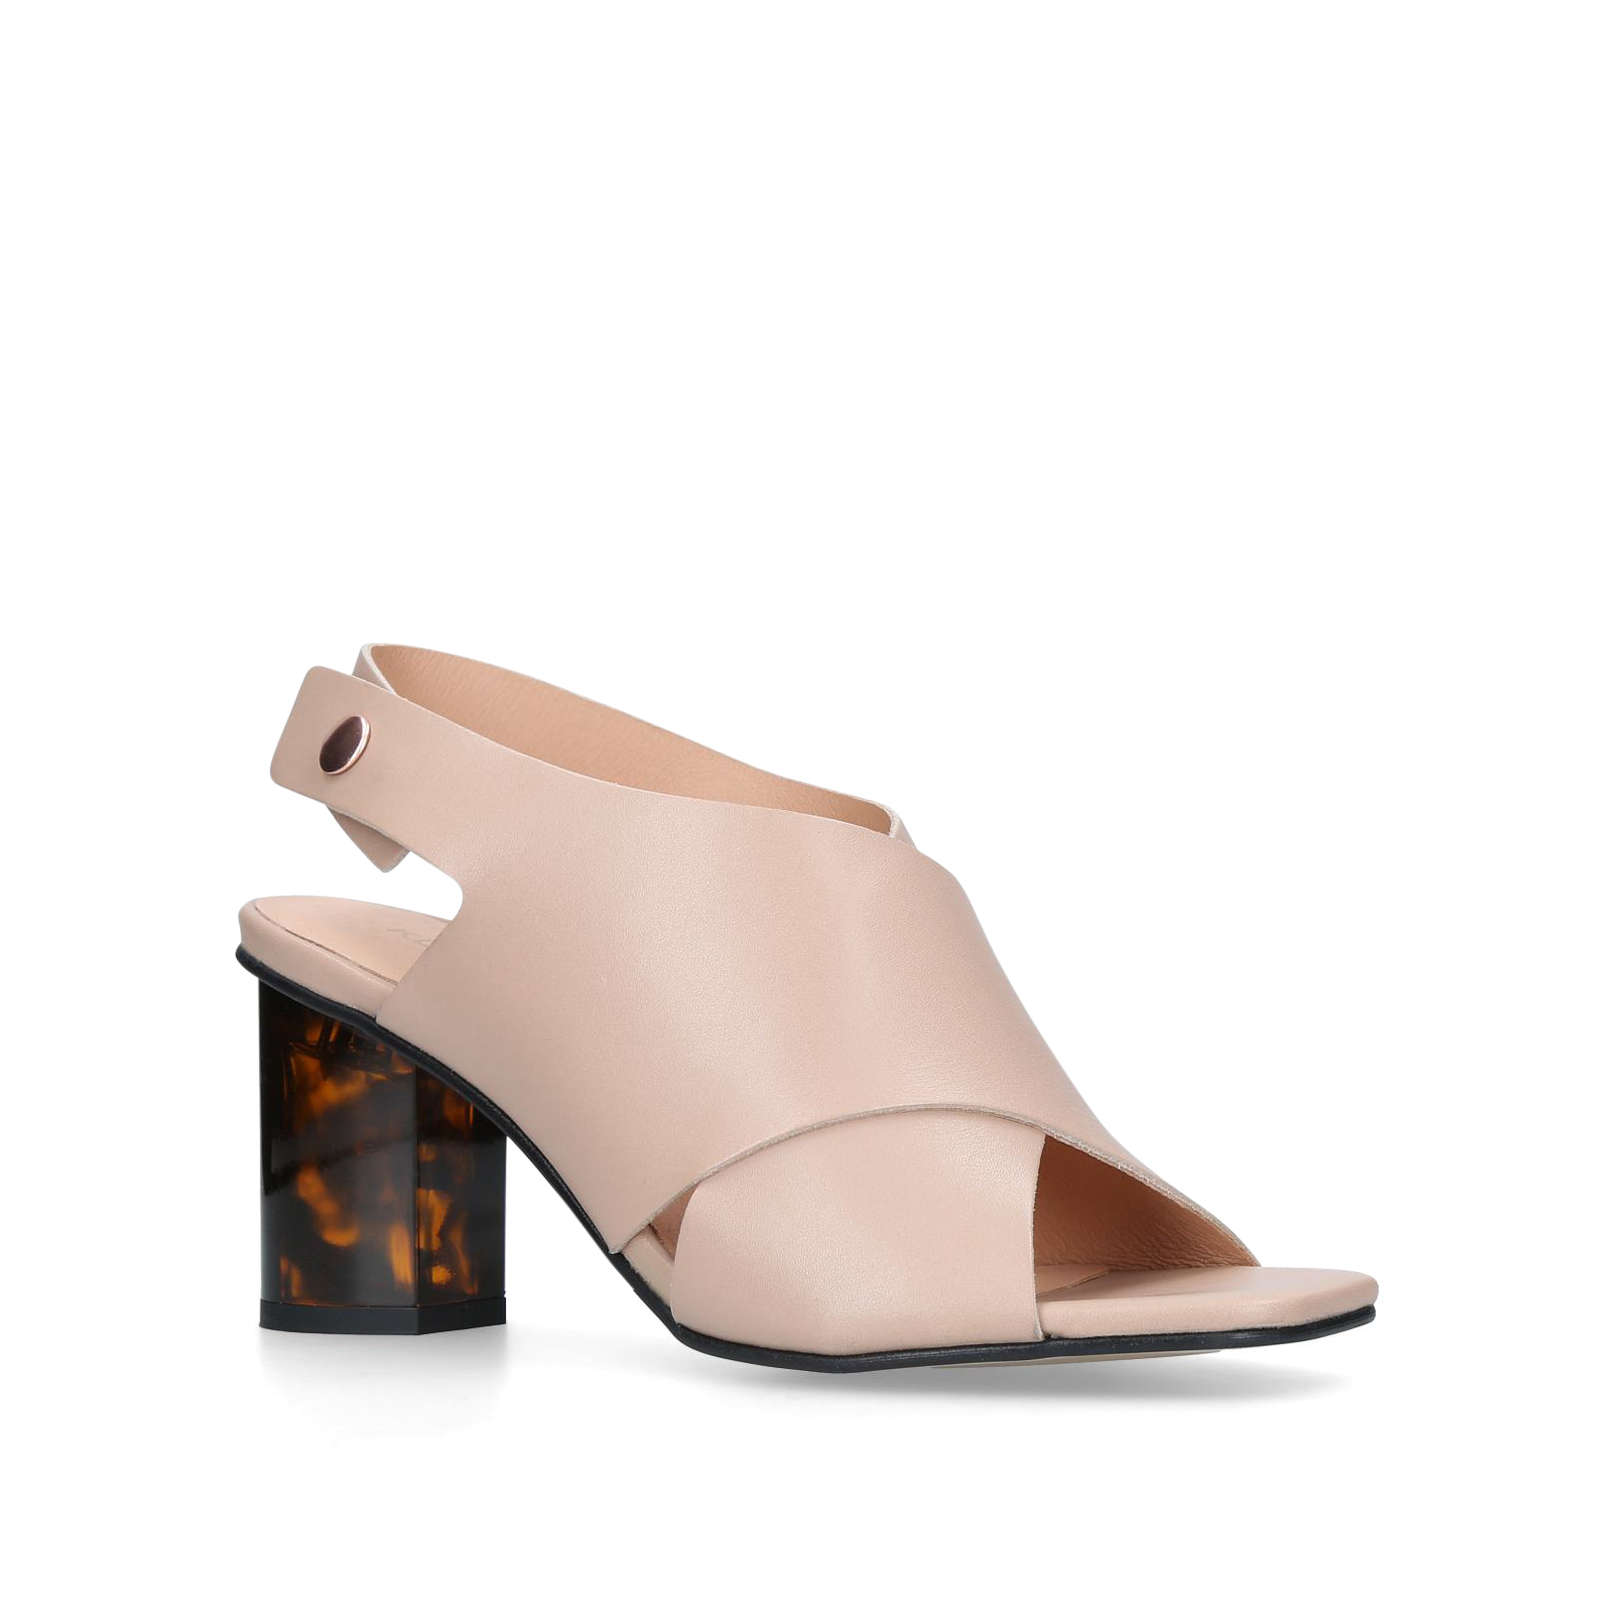 1725a787675 Stride Mid Heel Sandals